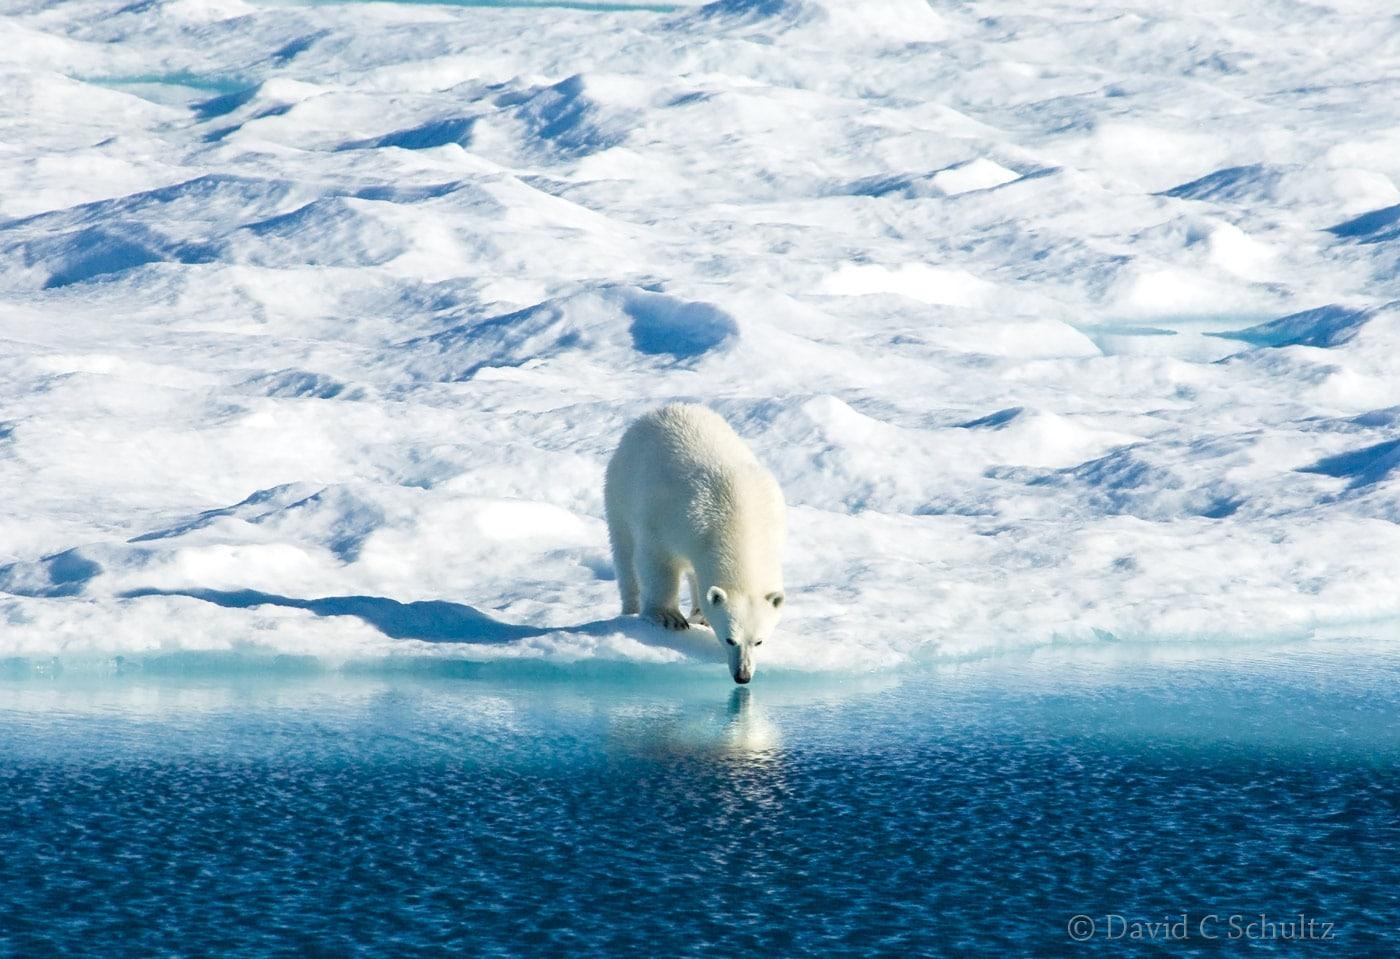 Polar bear, Canada - Image #168-1350